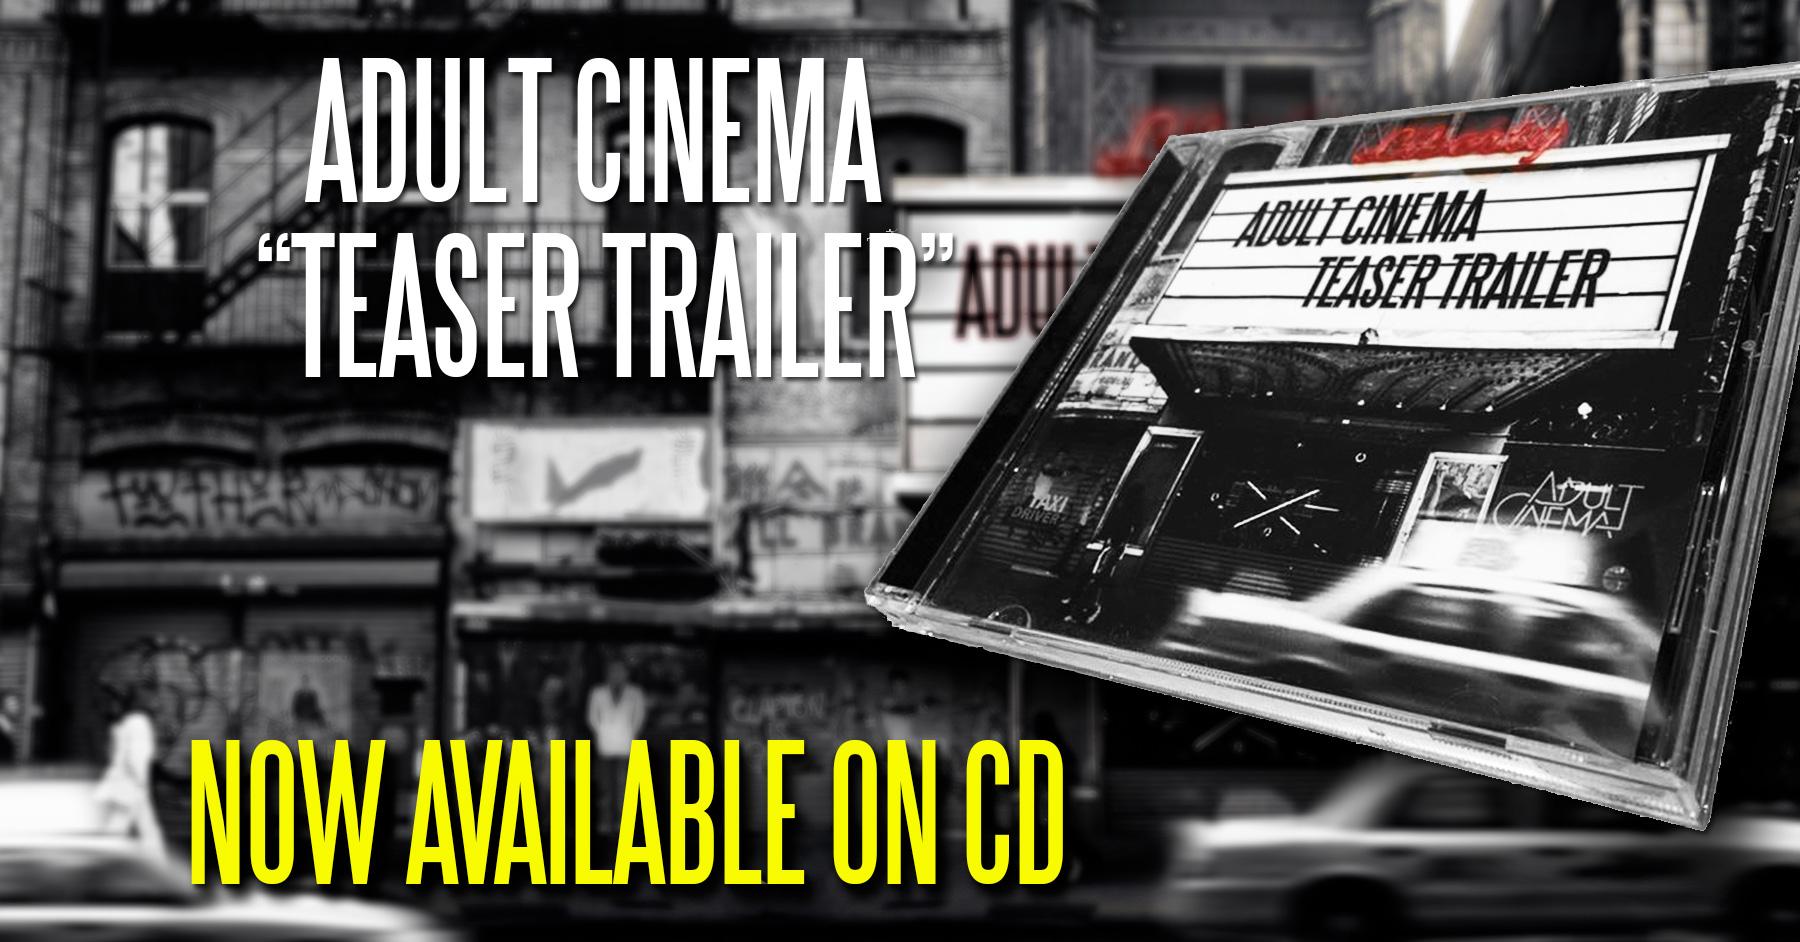 teaser-trailer-advert